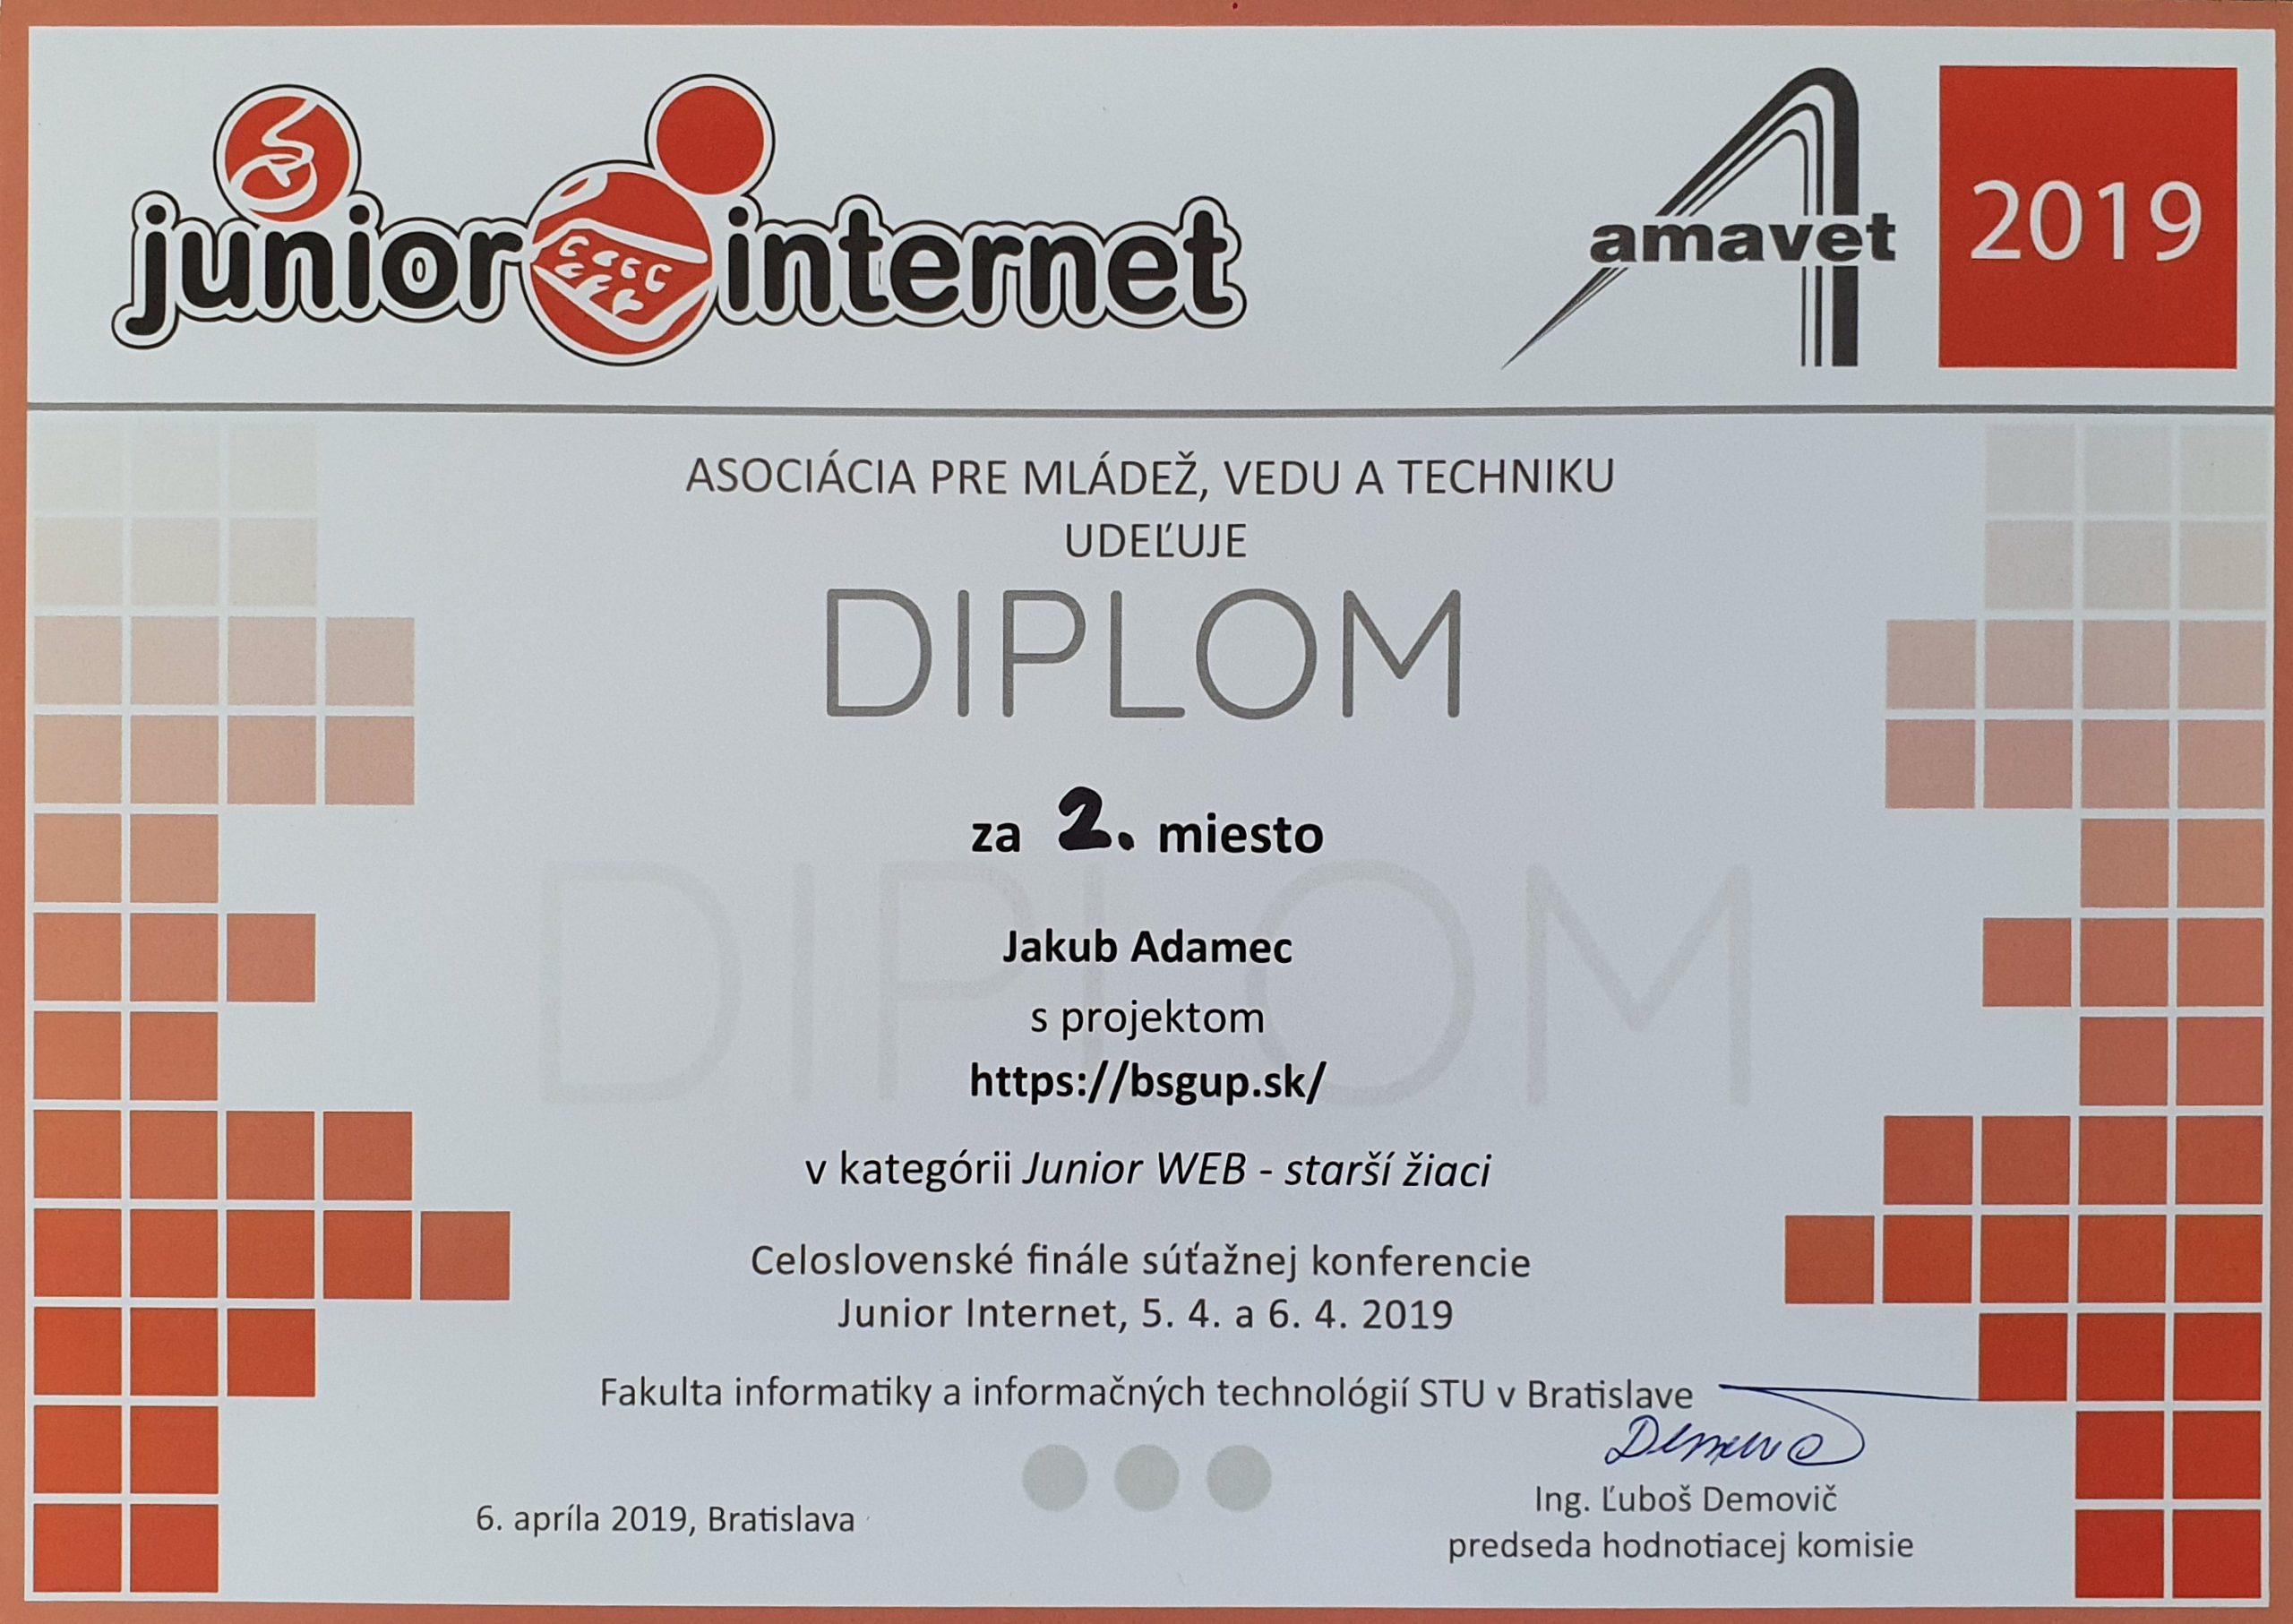 2. miesto, Junior Internet AMAVET